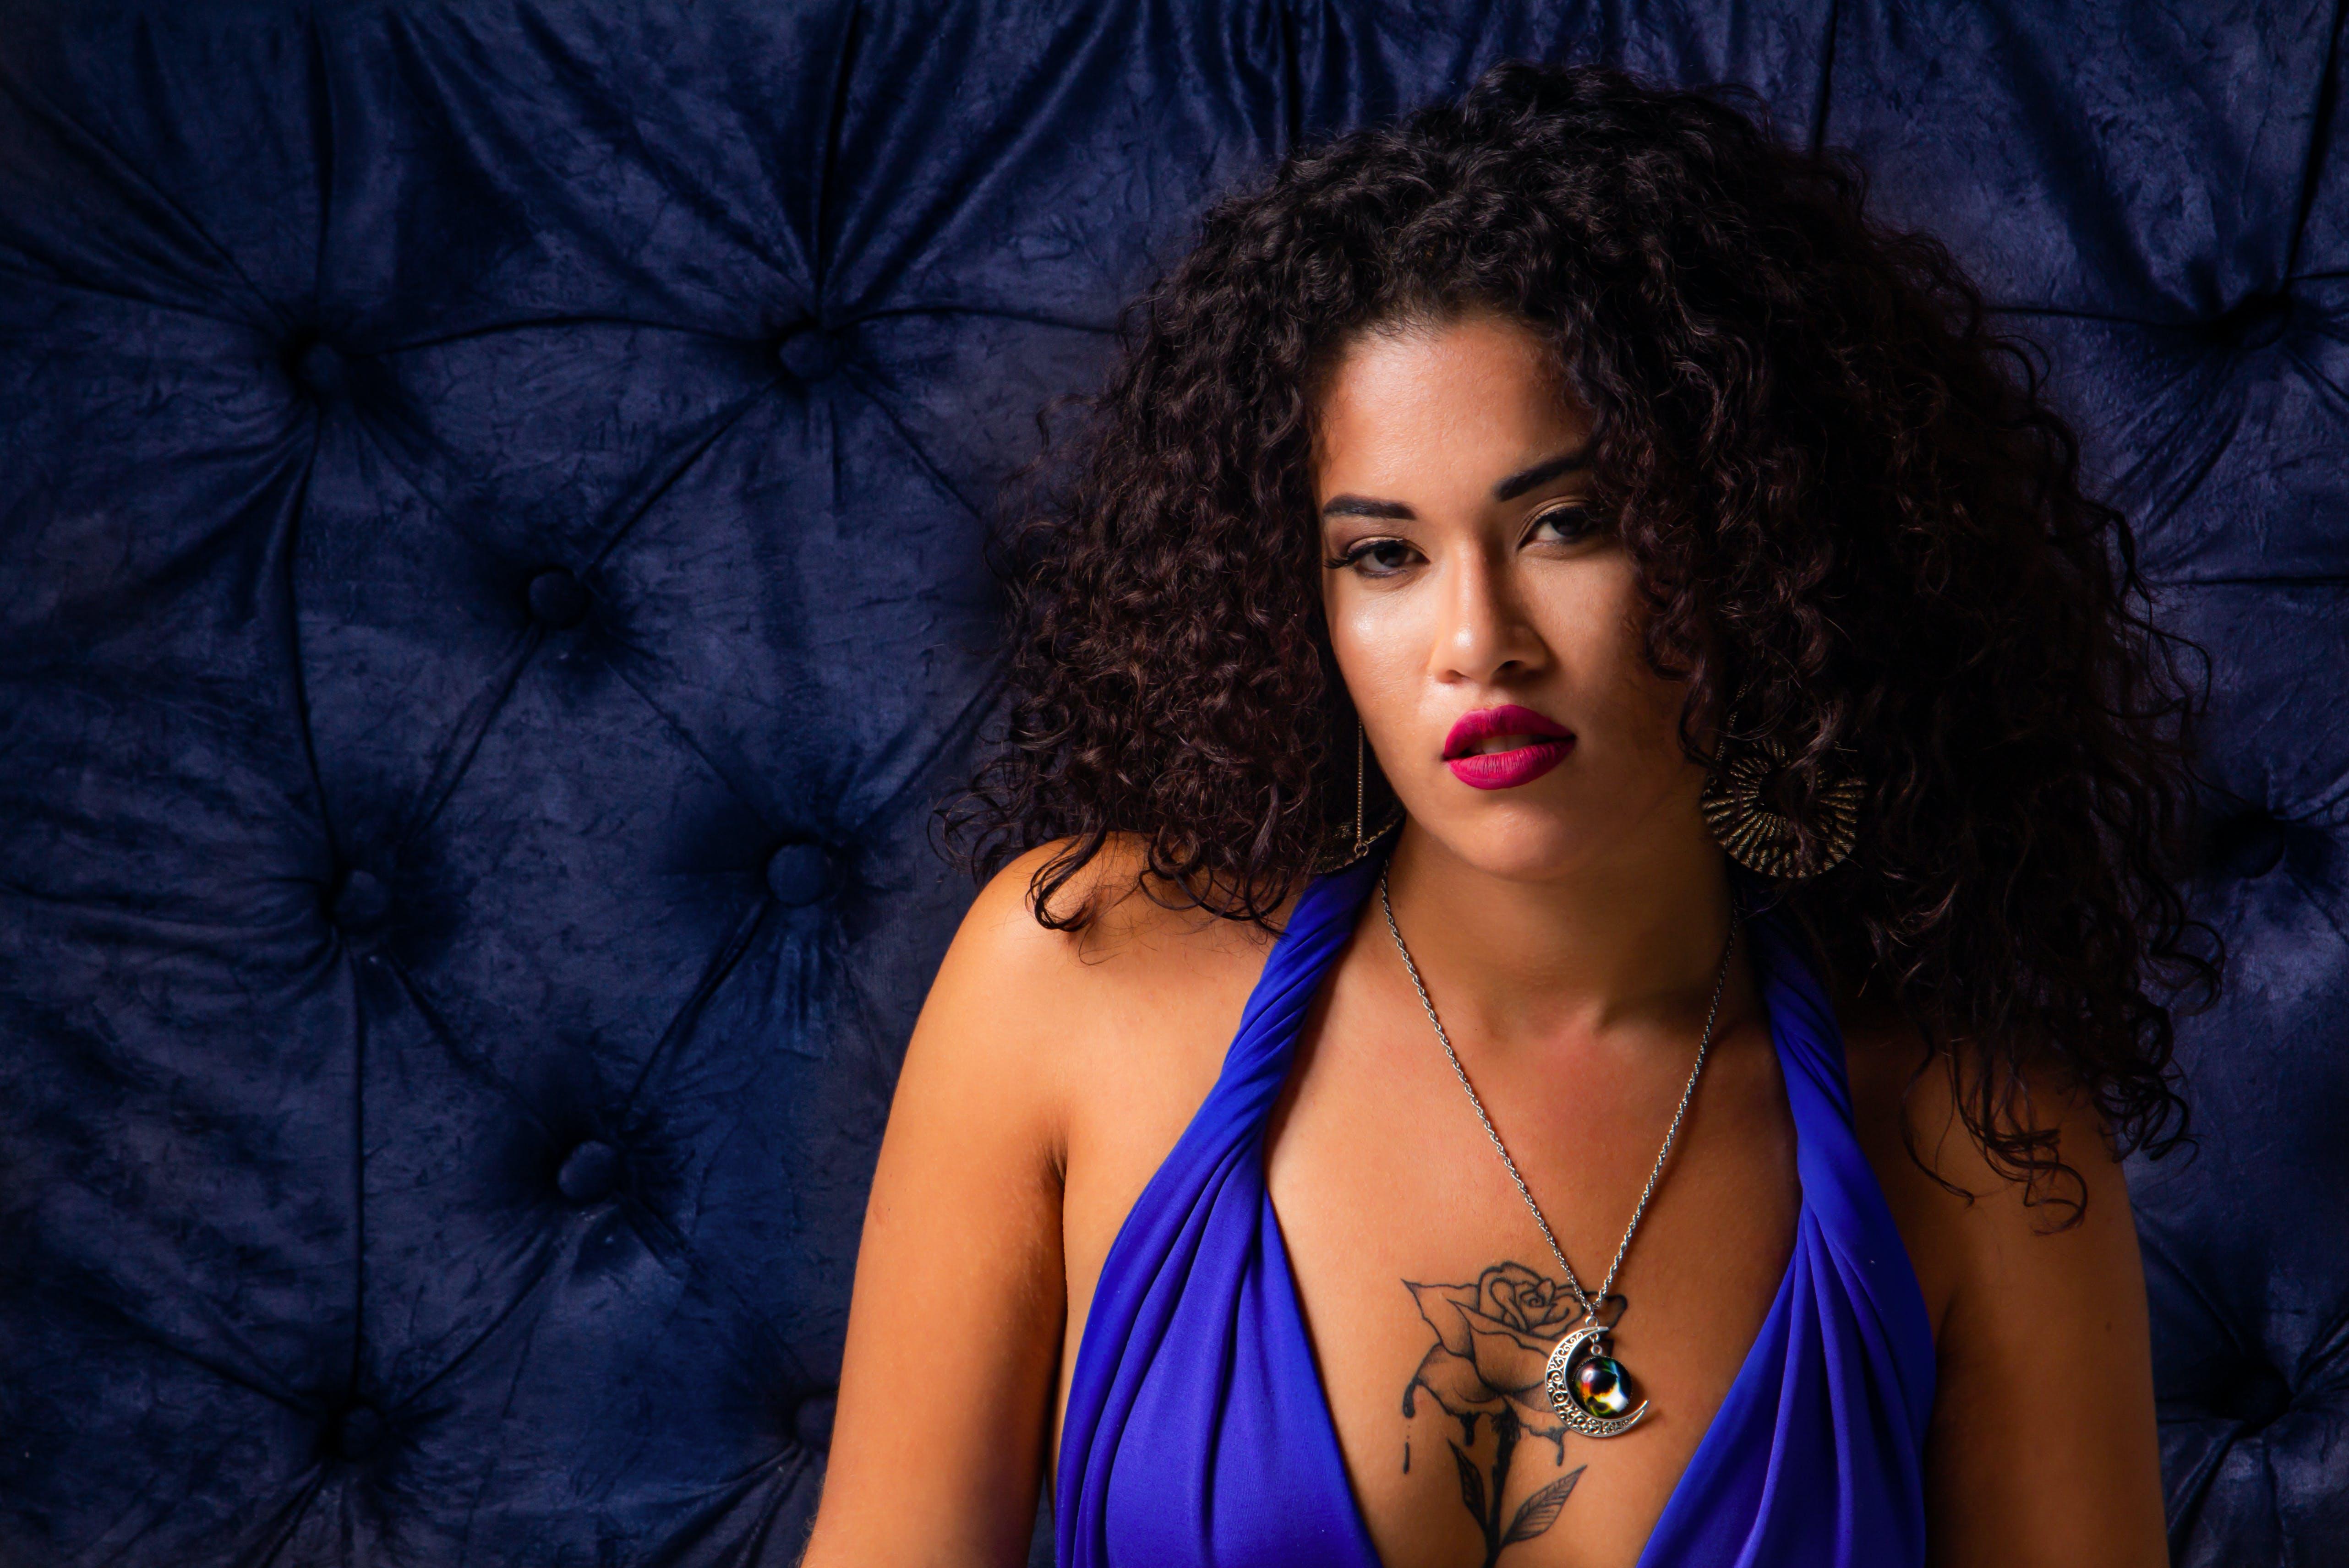 Free stock photo of woman, sensual, sensuality, black woman